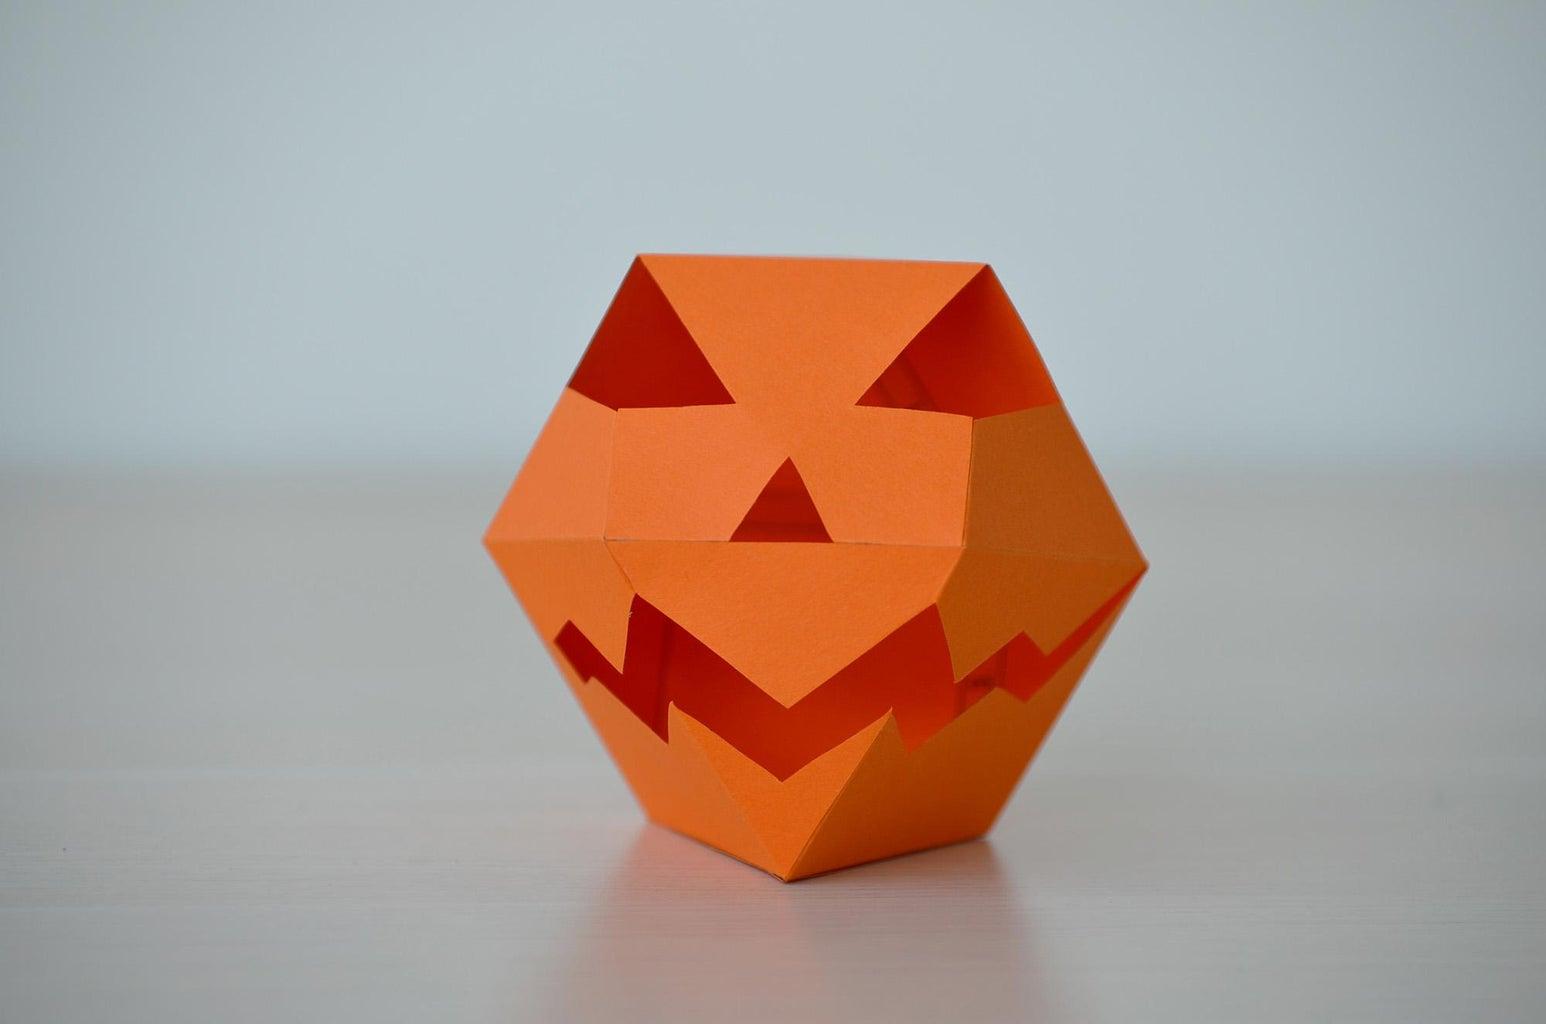 Assembling the Cuboctahedron